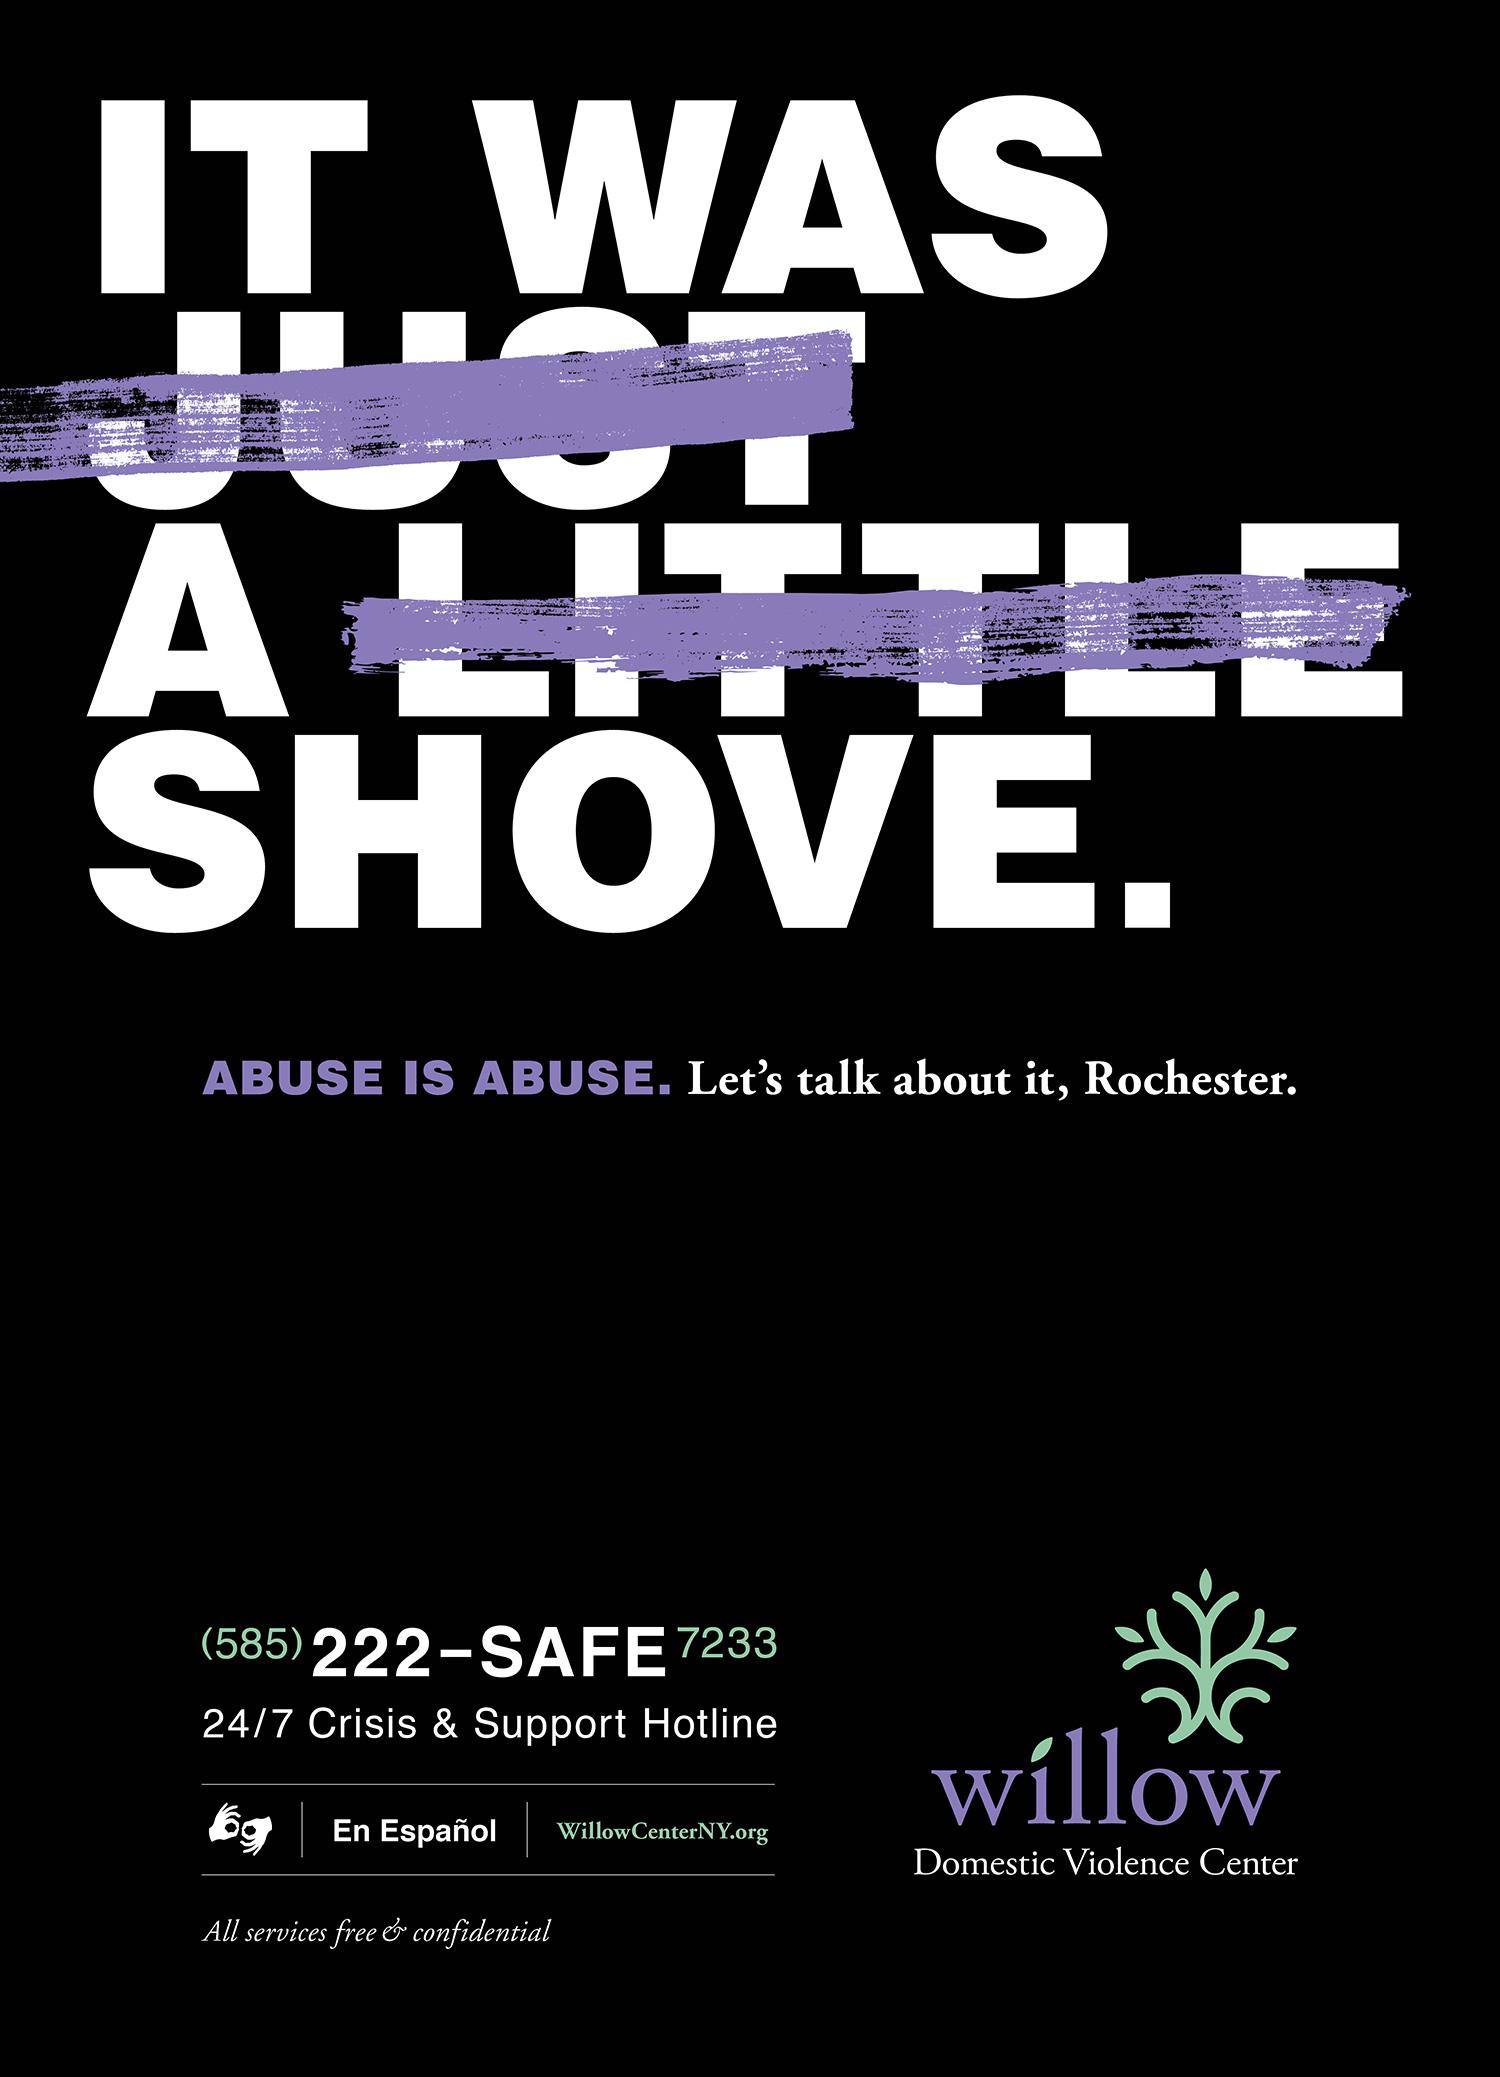 Willow_13x18_Poster_Shove_ROC_purple_green_lite.jpg